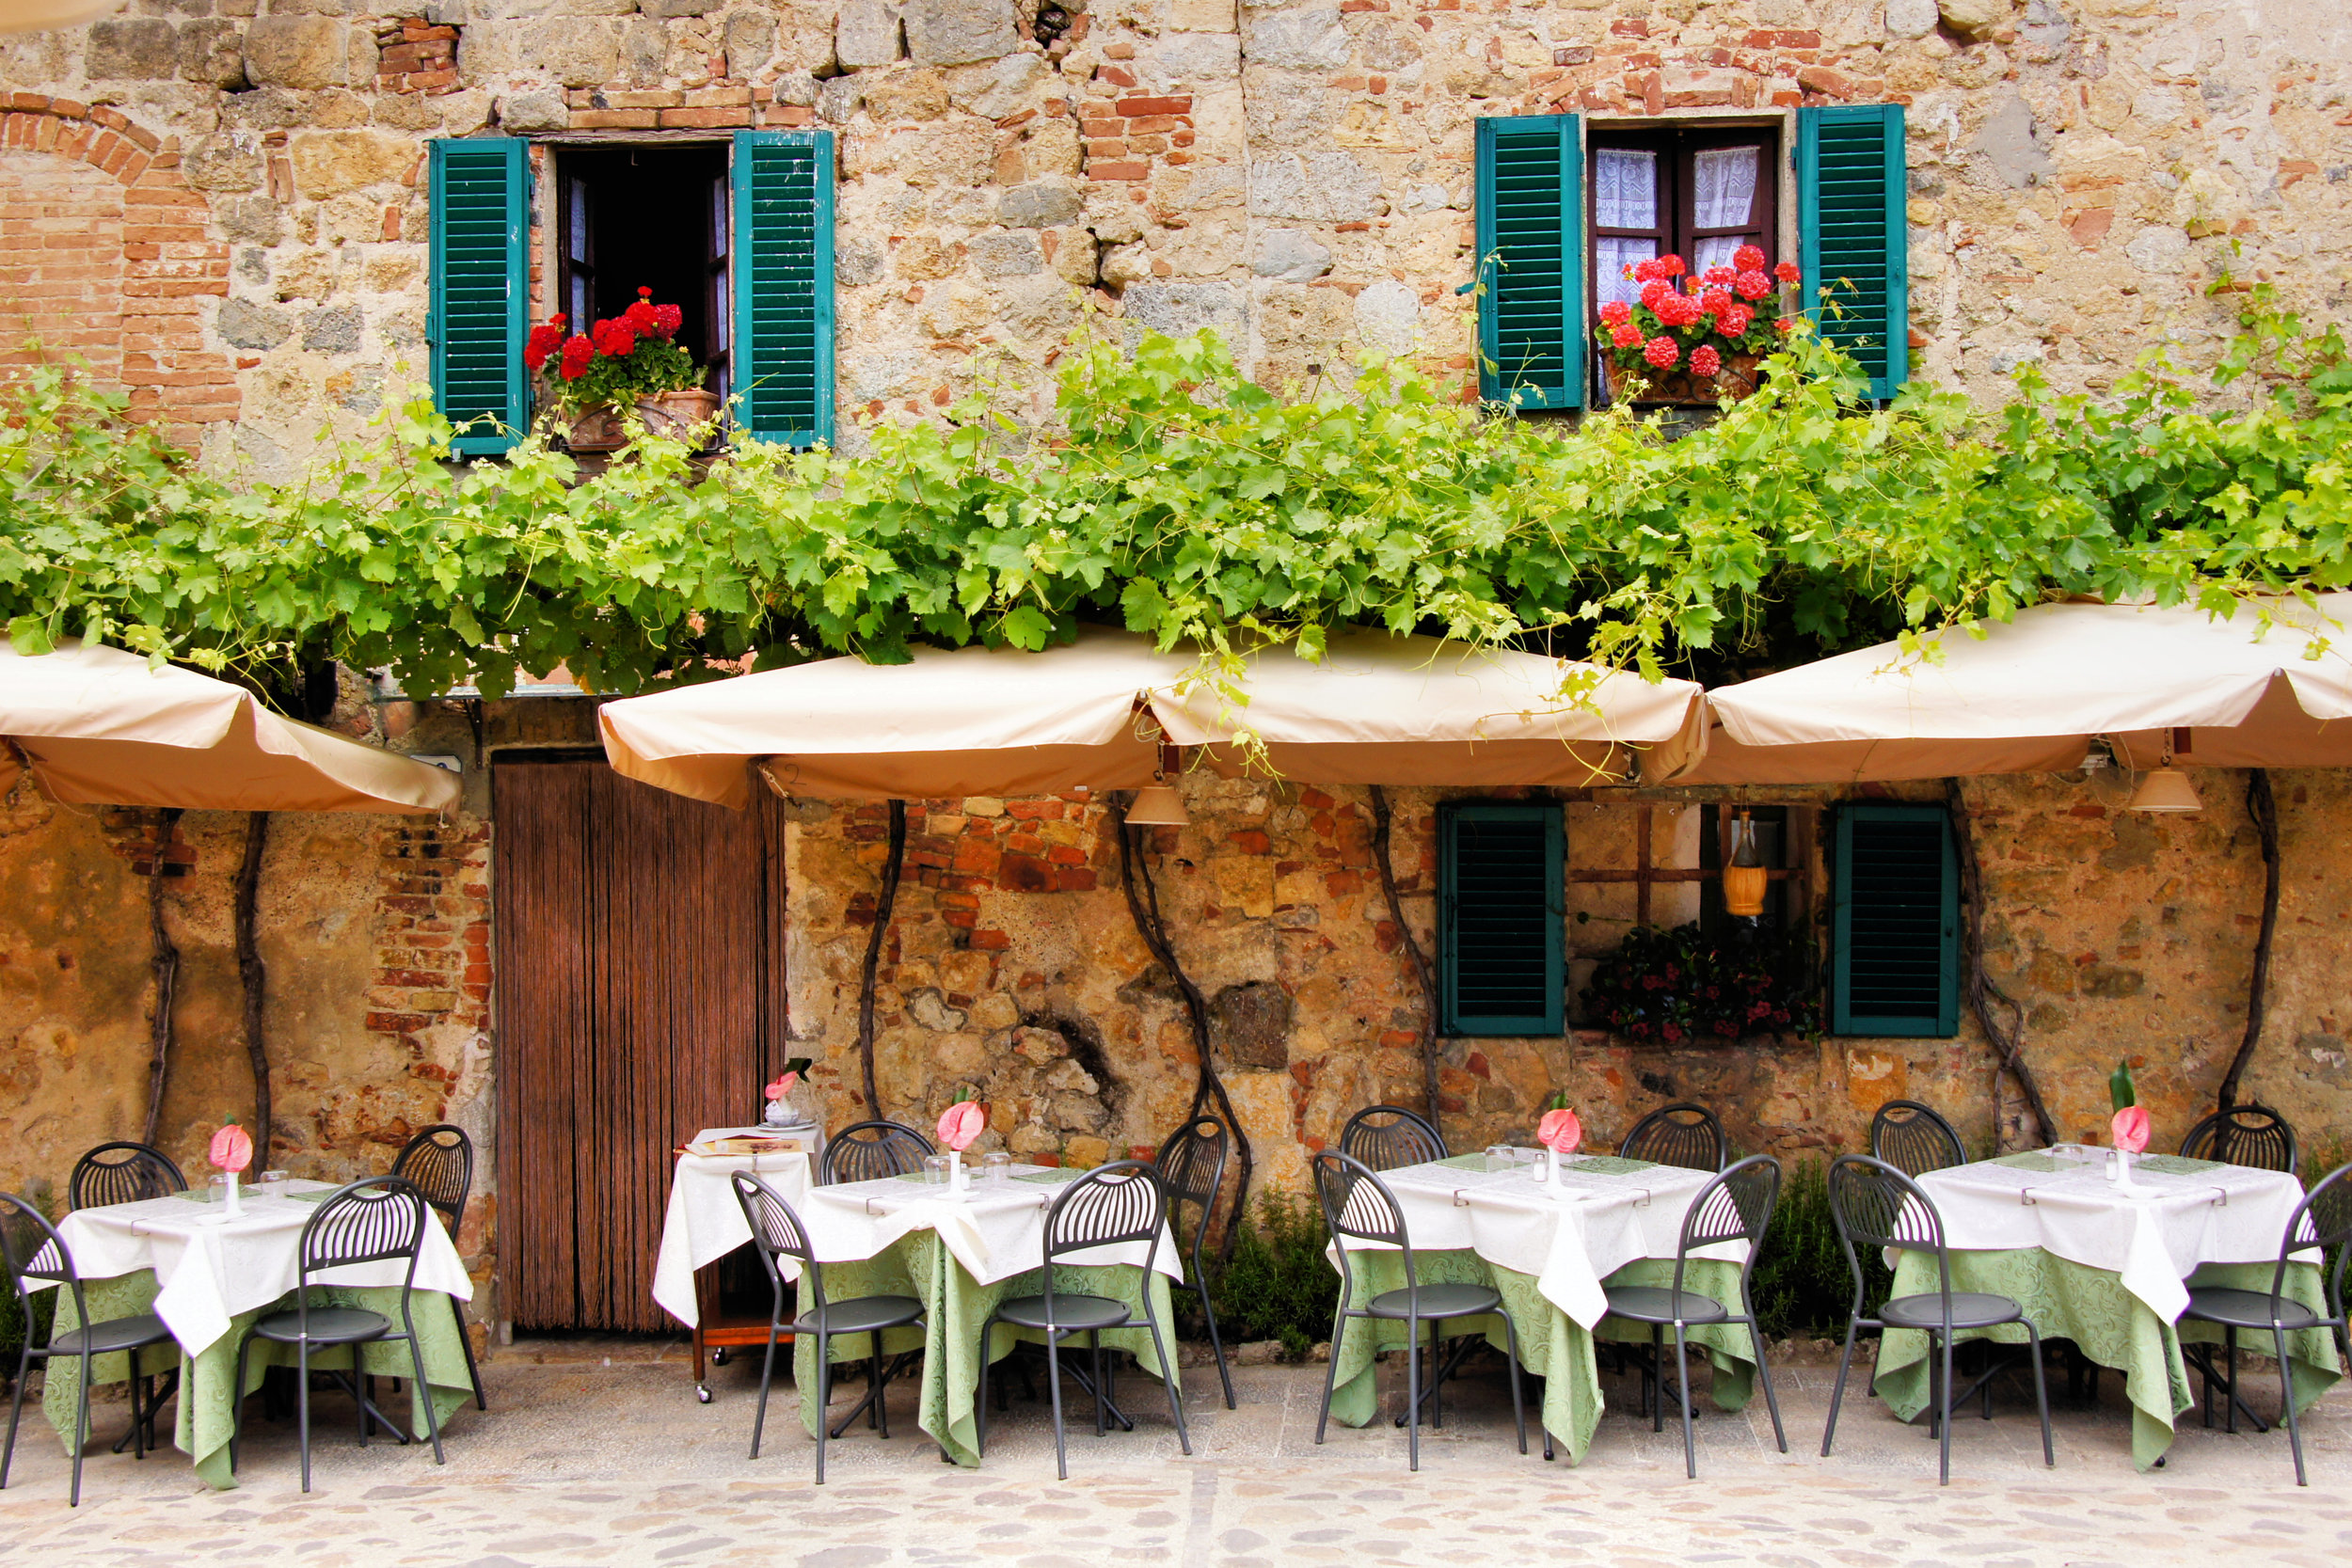 Boston Luxury Custom Honeymoon Travel Agent Advisor Planning Italy Village Trattoria Tuscany.jpeg